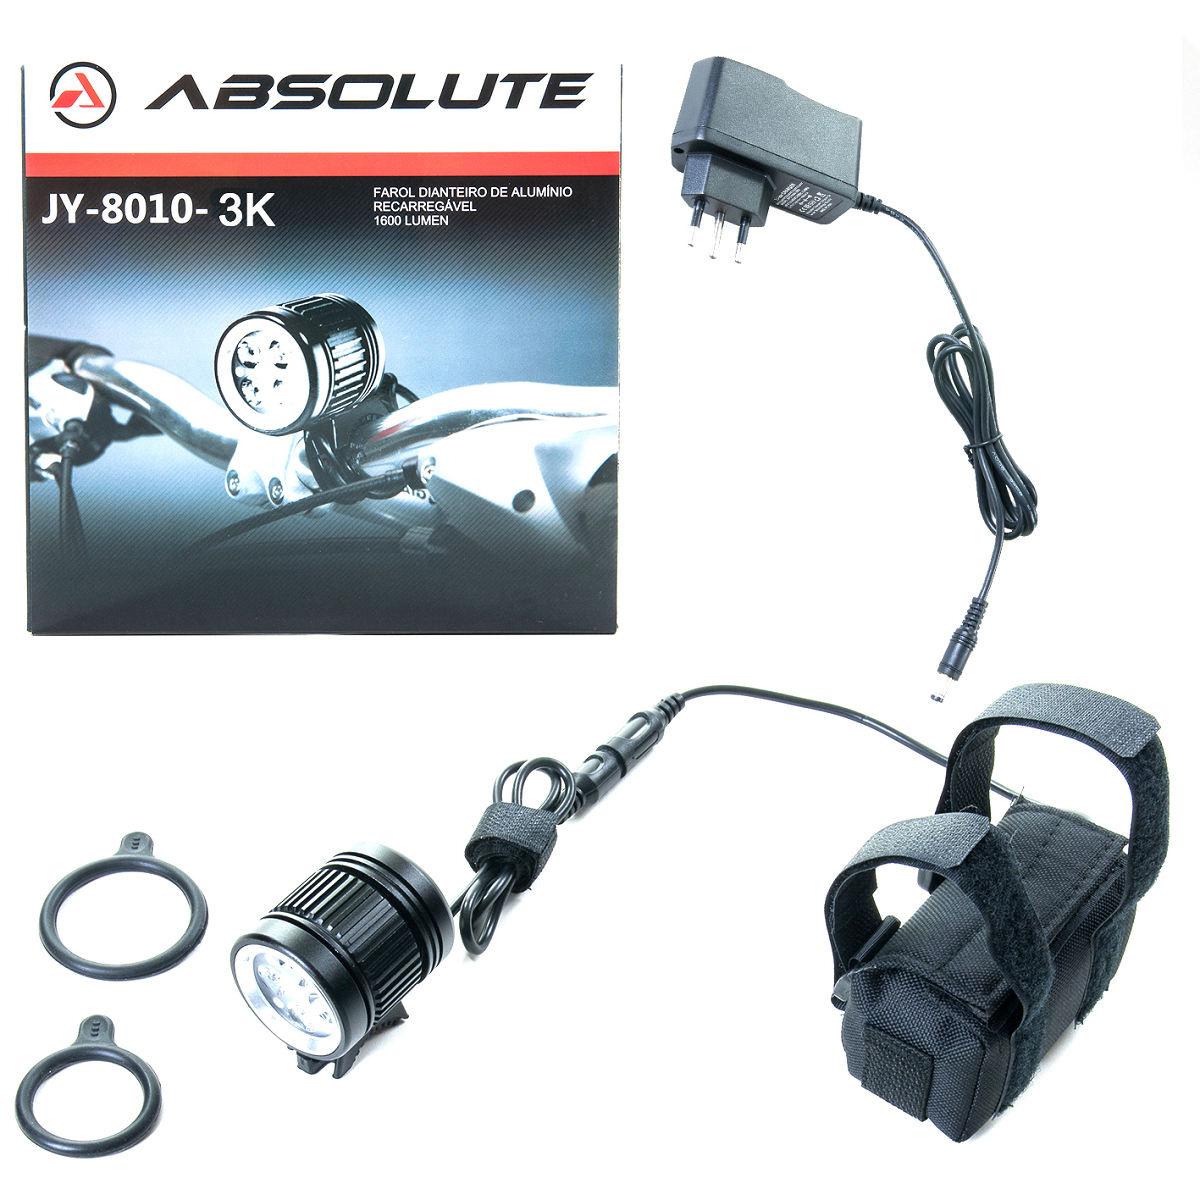 Farol Absolute JY-8010-3K - 3000 lumens